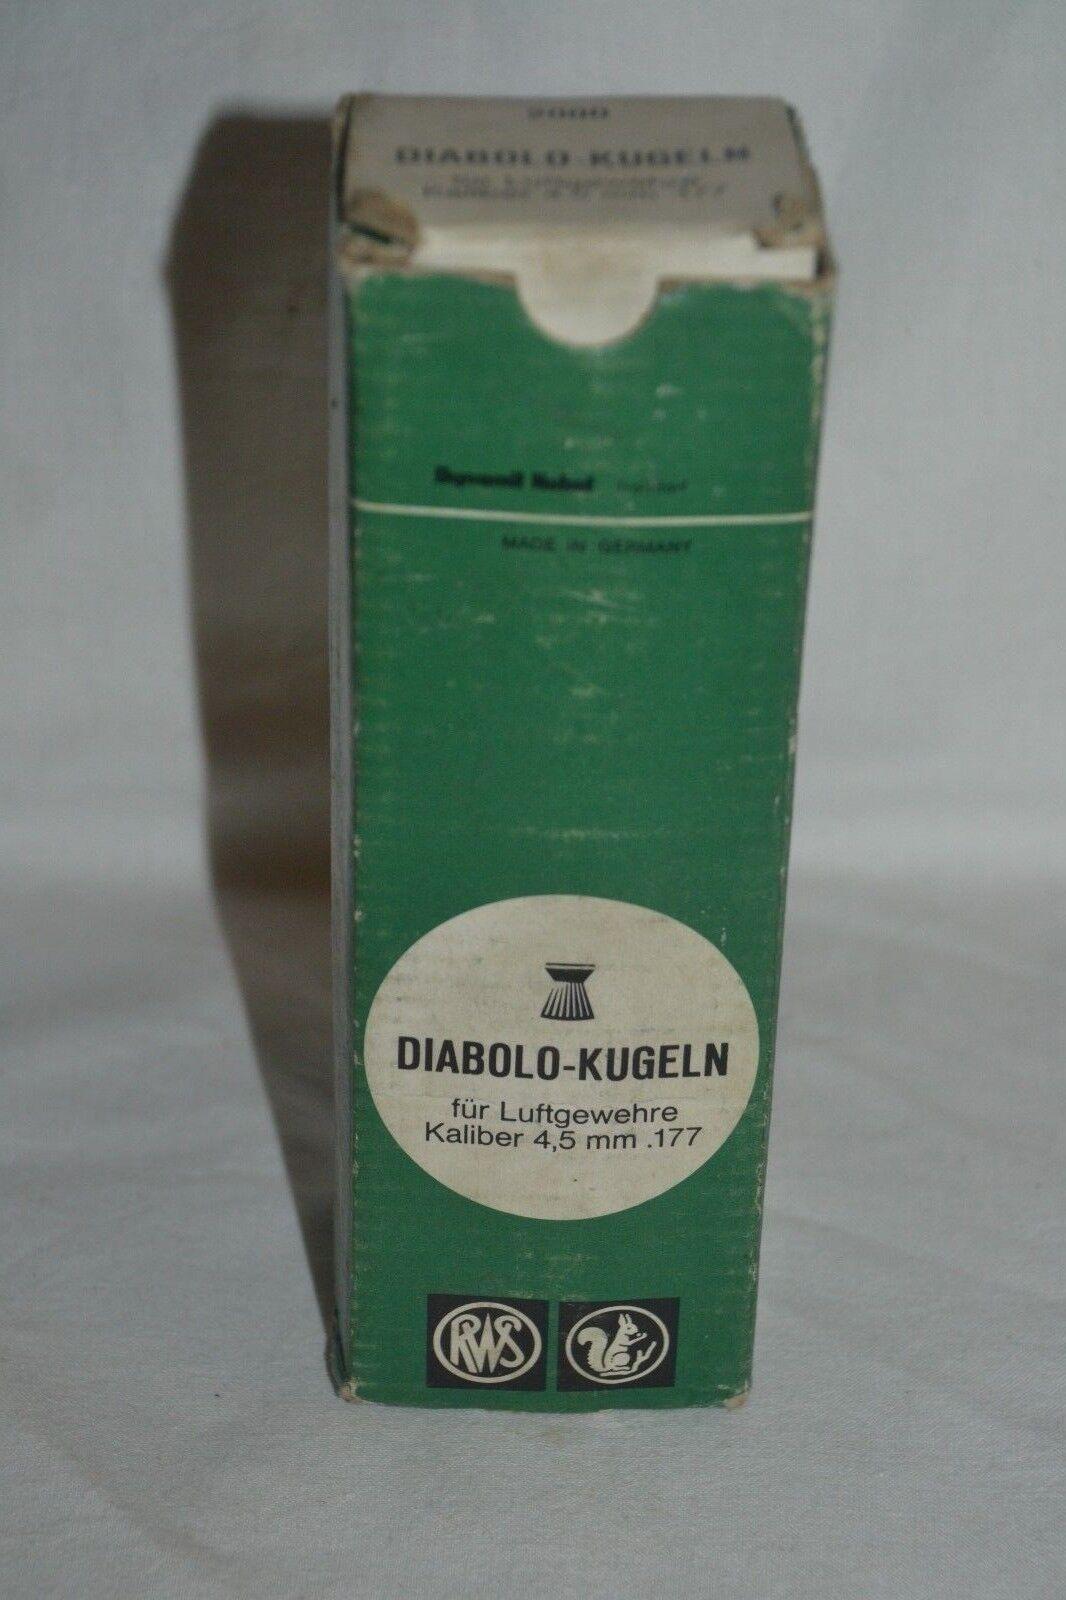 Vintage RWS Diabolo Kugeln 4,5mm cal .177 Pellets Empty Box of 2000 Pellets